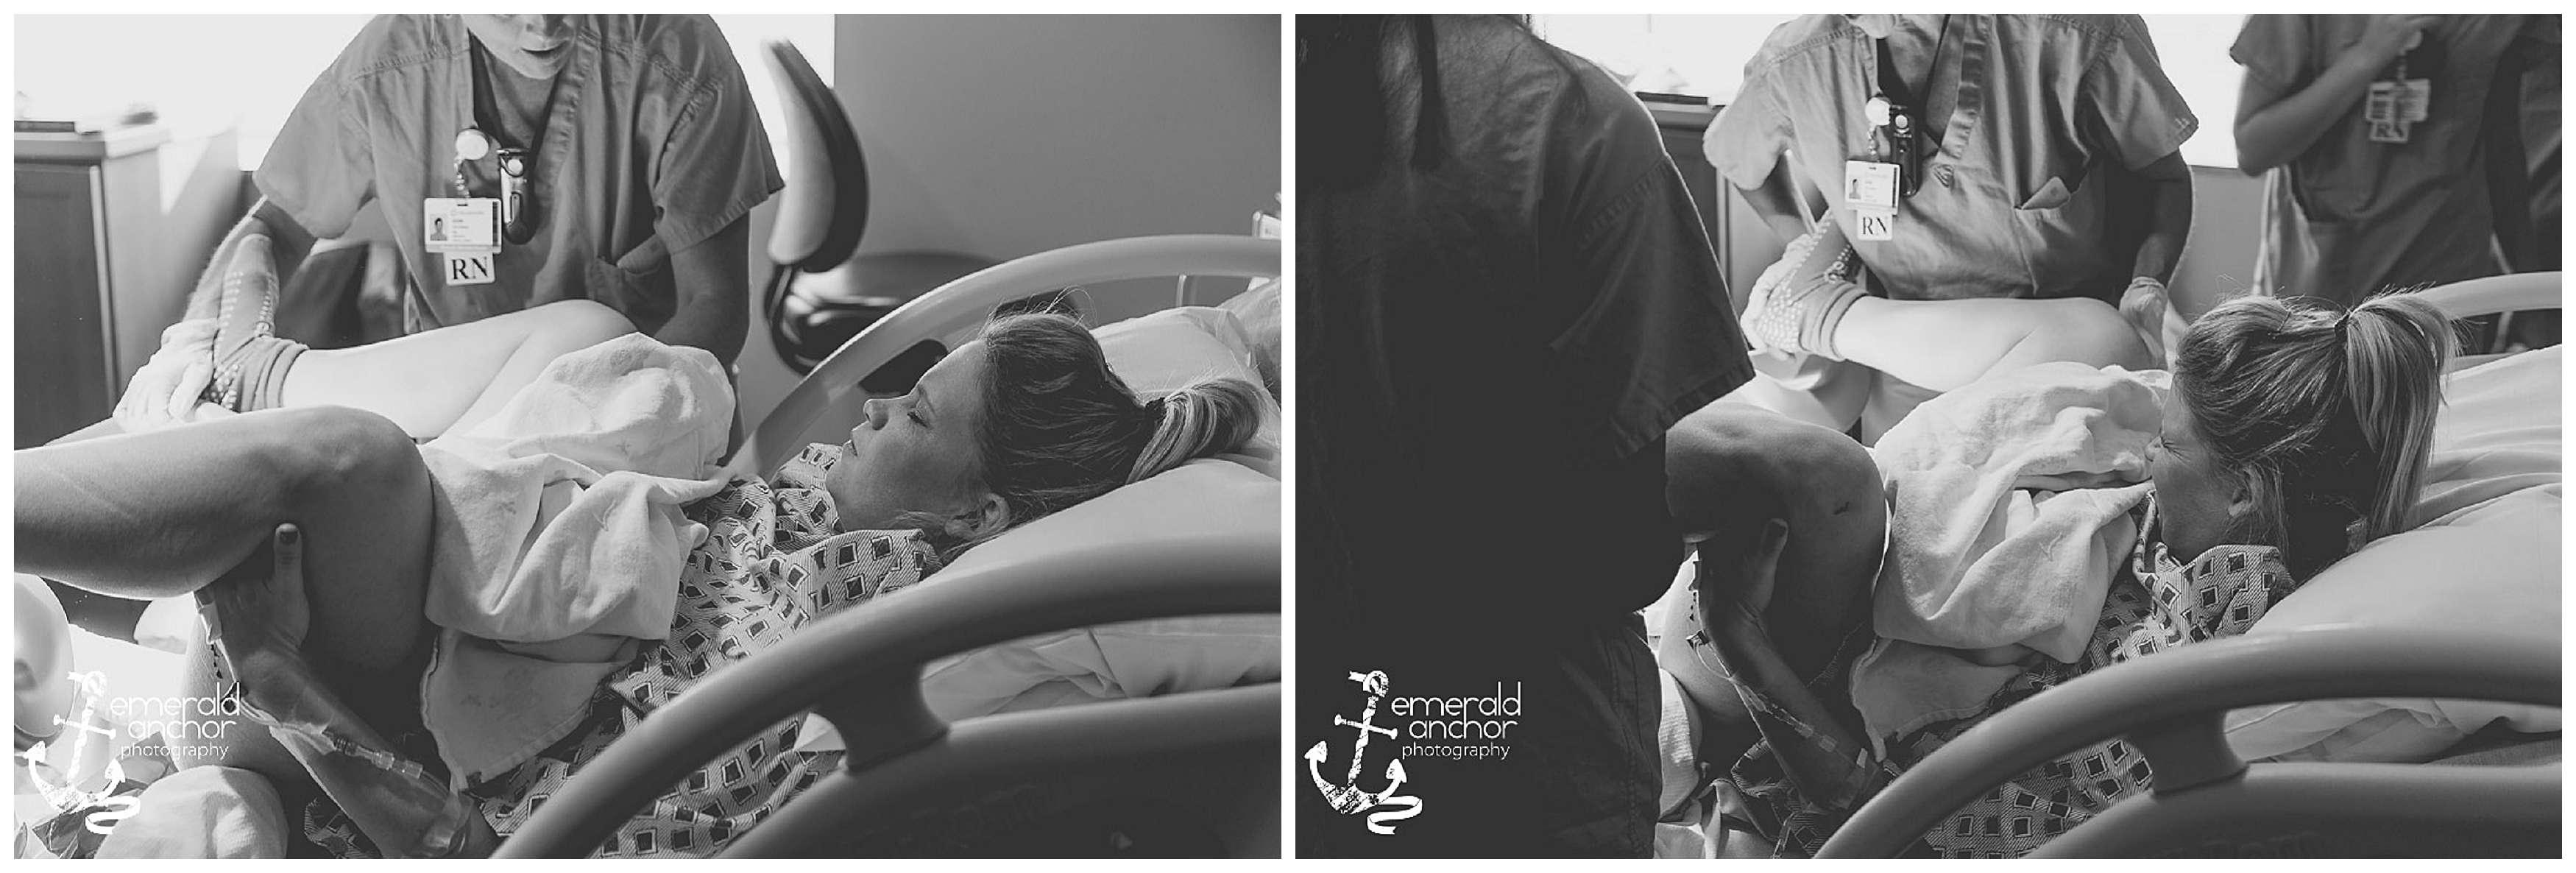 Emerald Anchor Photography Riverside Hospital Birth Story Photography Uriah Kade (53)